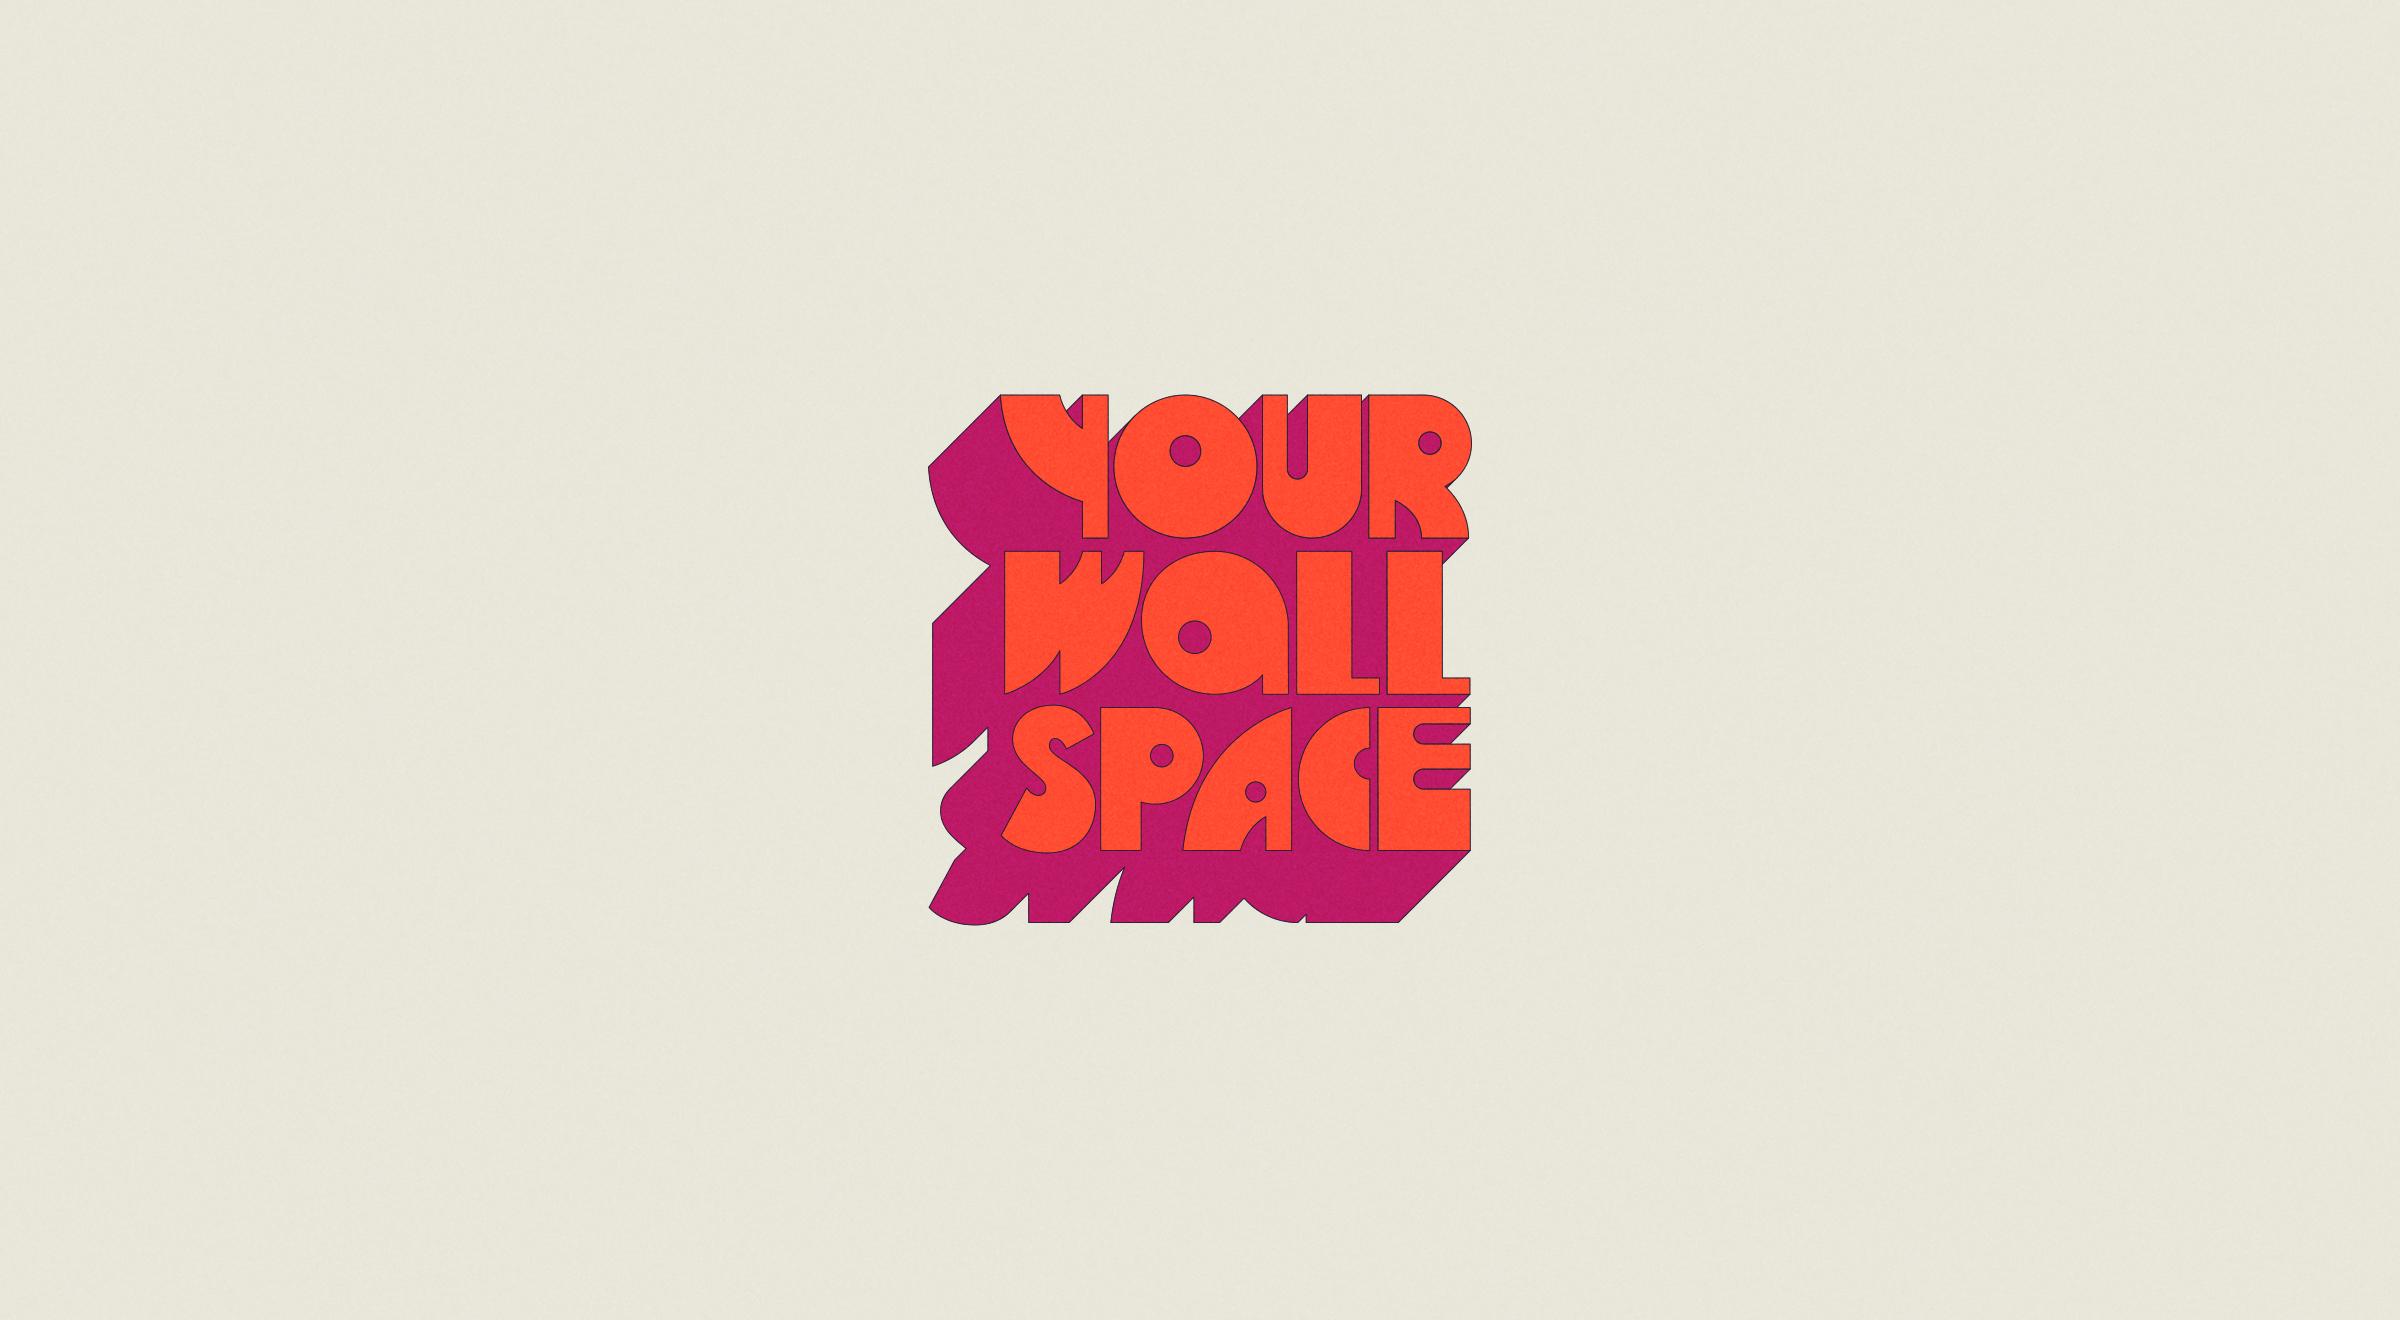 TBS_YourWallSpace_Wide